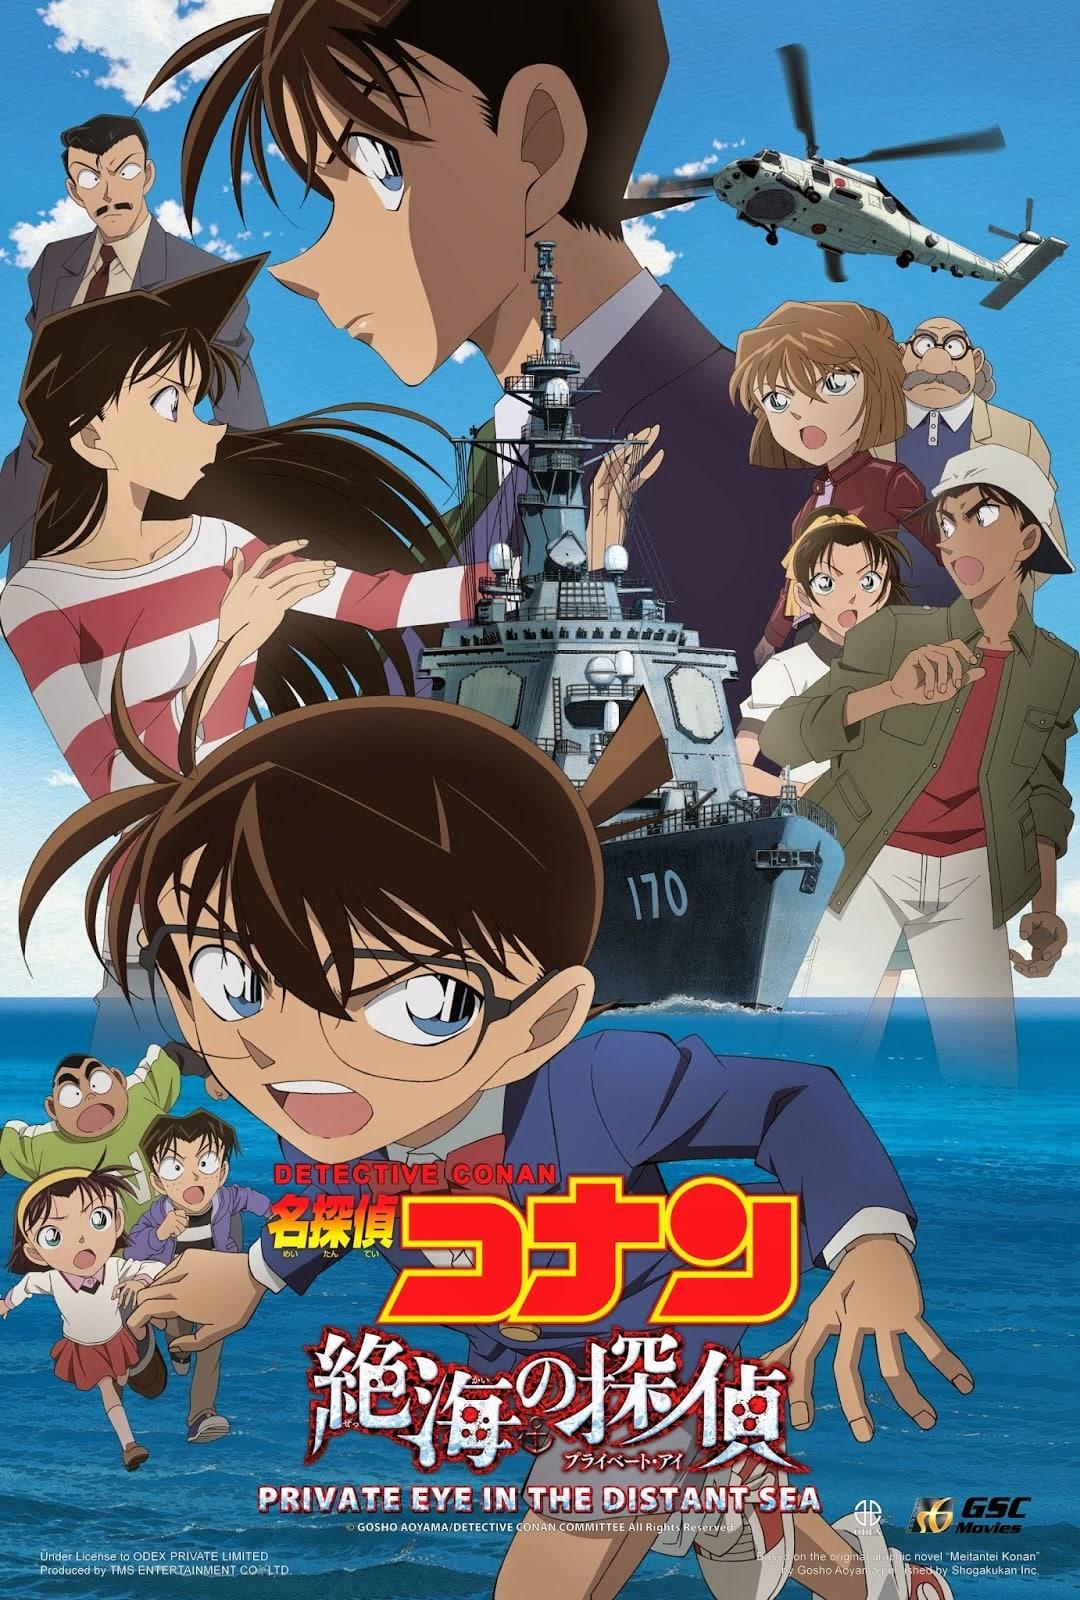 Conan Movie 17 : Private Eye in the Distant Sea ฝ่าวิกฤติเรือรบมรณะ